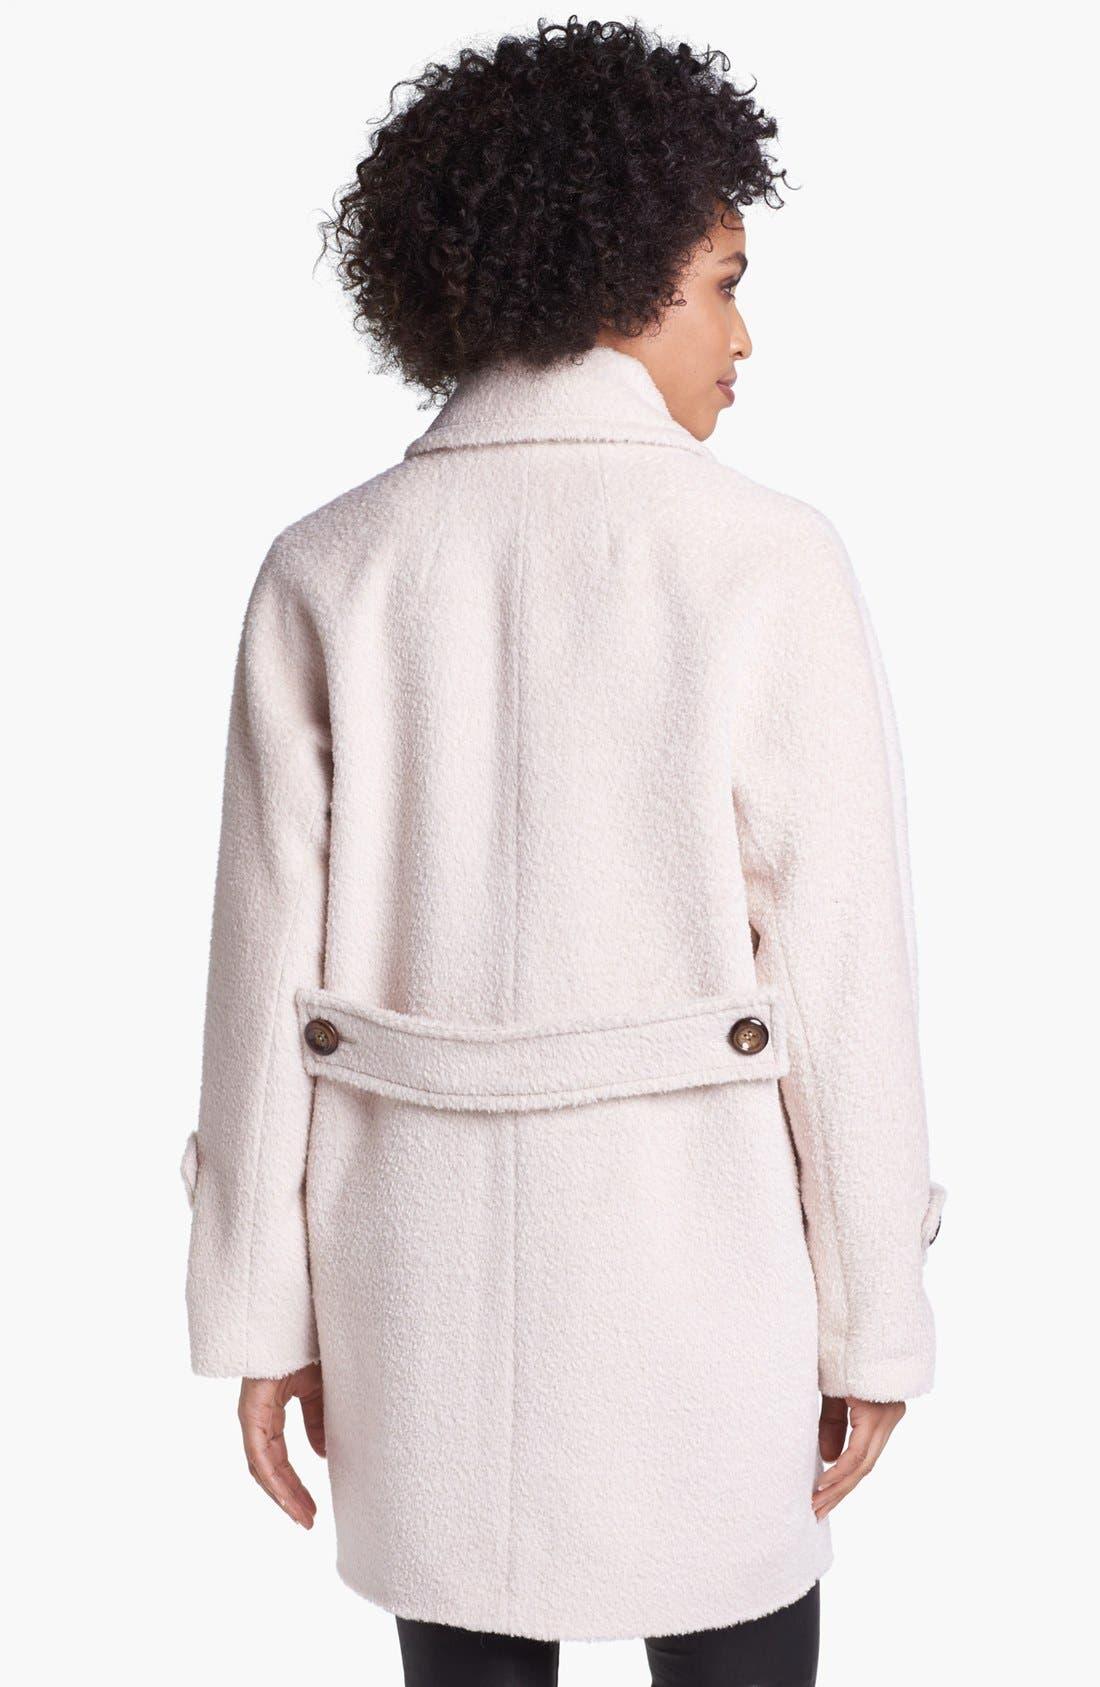 'Nancy' Sheared Wool & Alpaca Blend Coat,                             Alternate thumbnail 3, color,                             Champagne